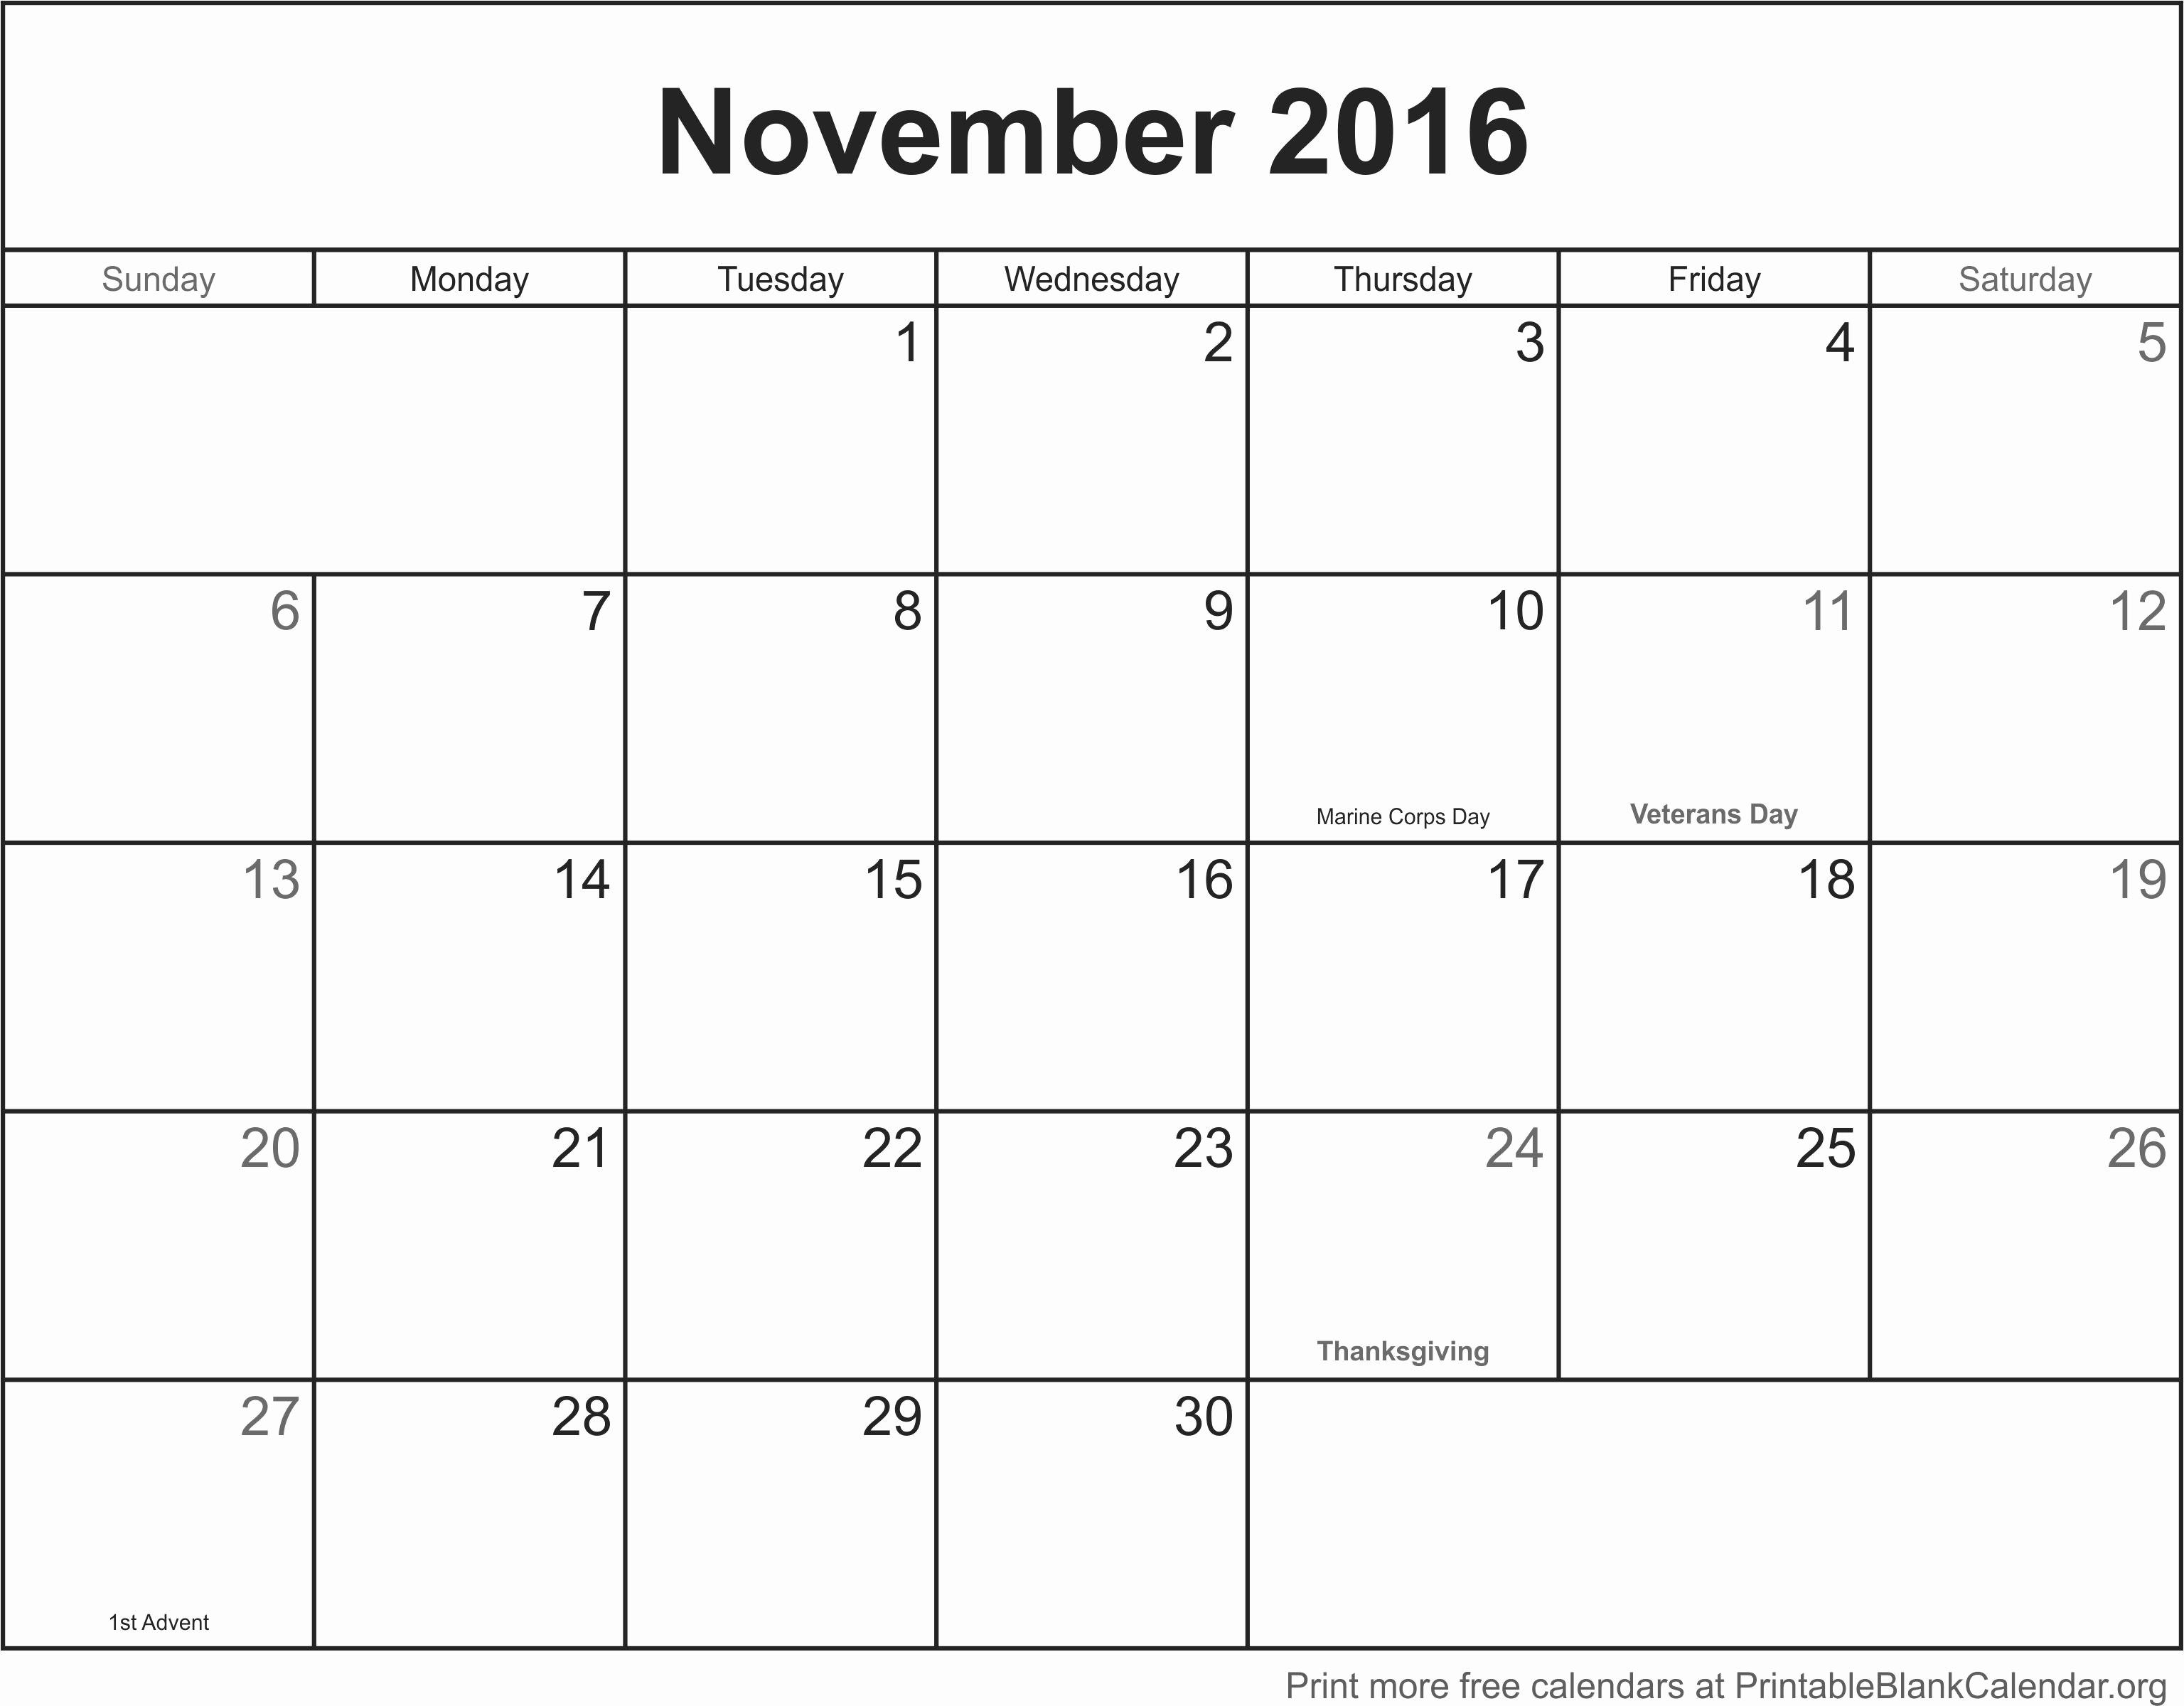 Free Downloadable 2016 Calendar Template Best Of November 2016 Printable Blank Calendar Printable Blank